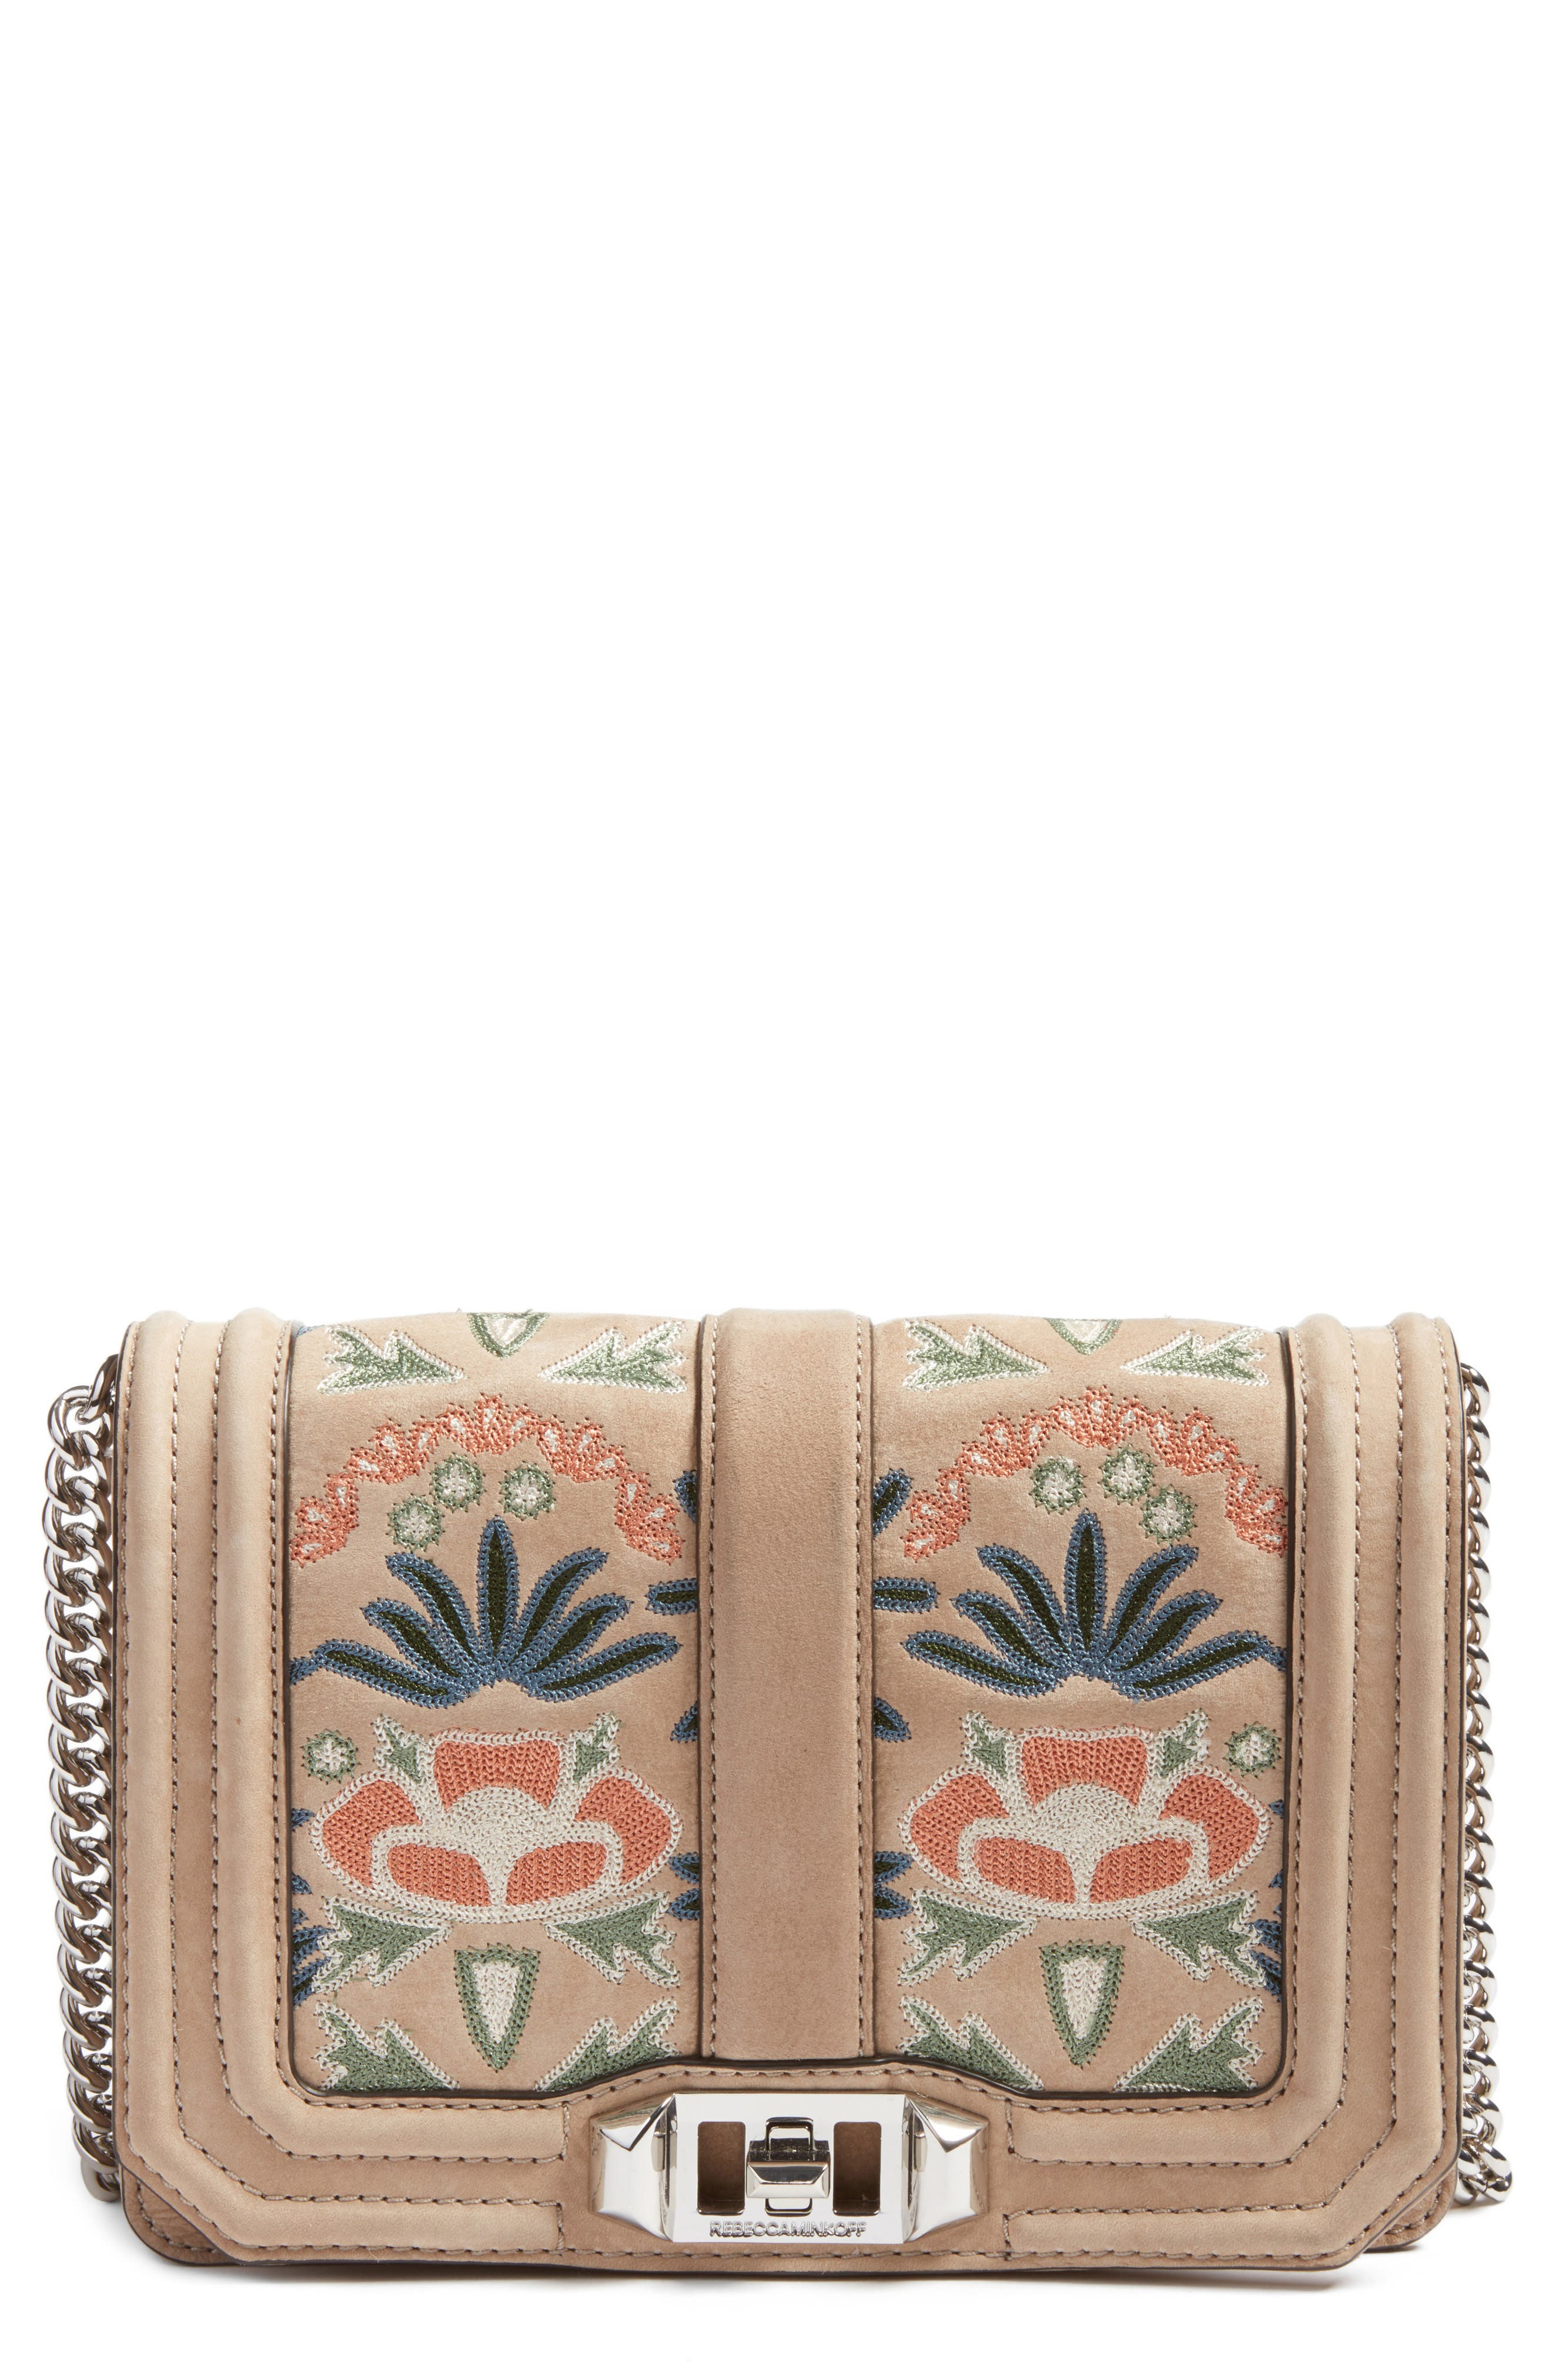 Rebecca Minkoff Small Love Embroidered Nubuck Crossbody Bag (Nordstrom Exclusive)